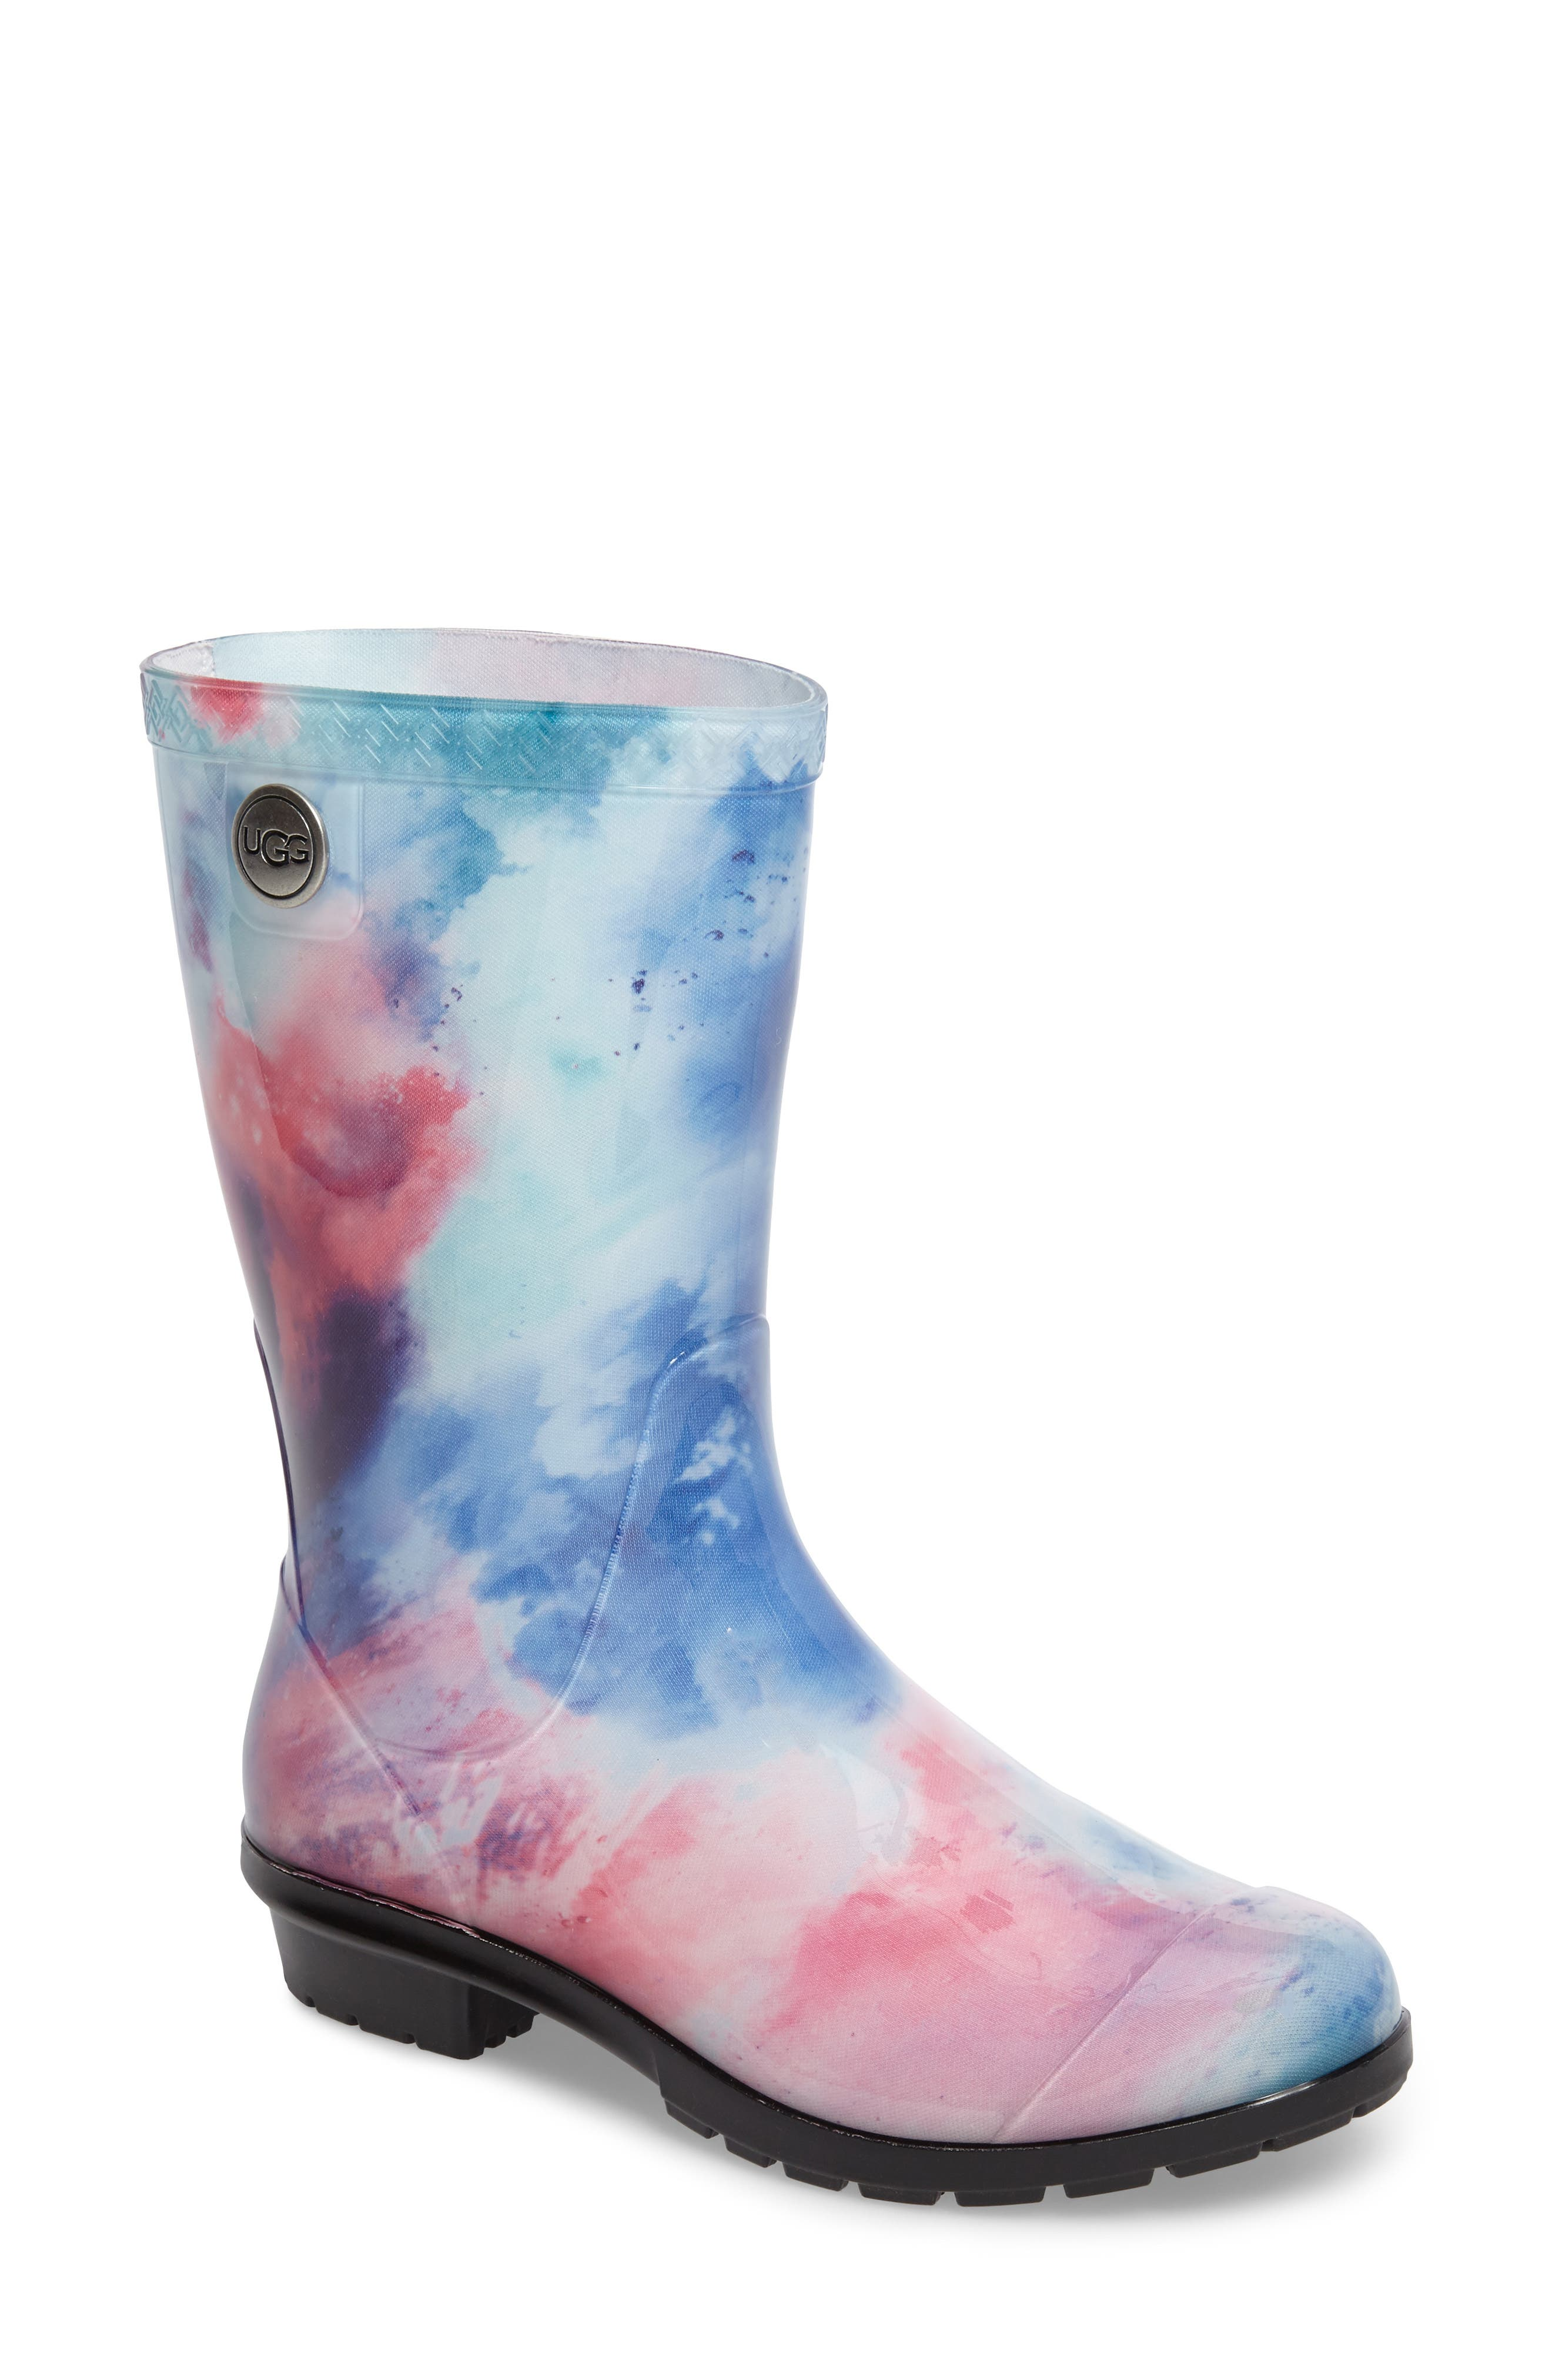 ugg pink rain boots